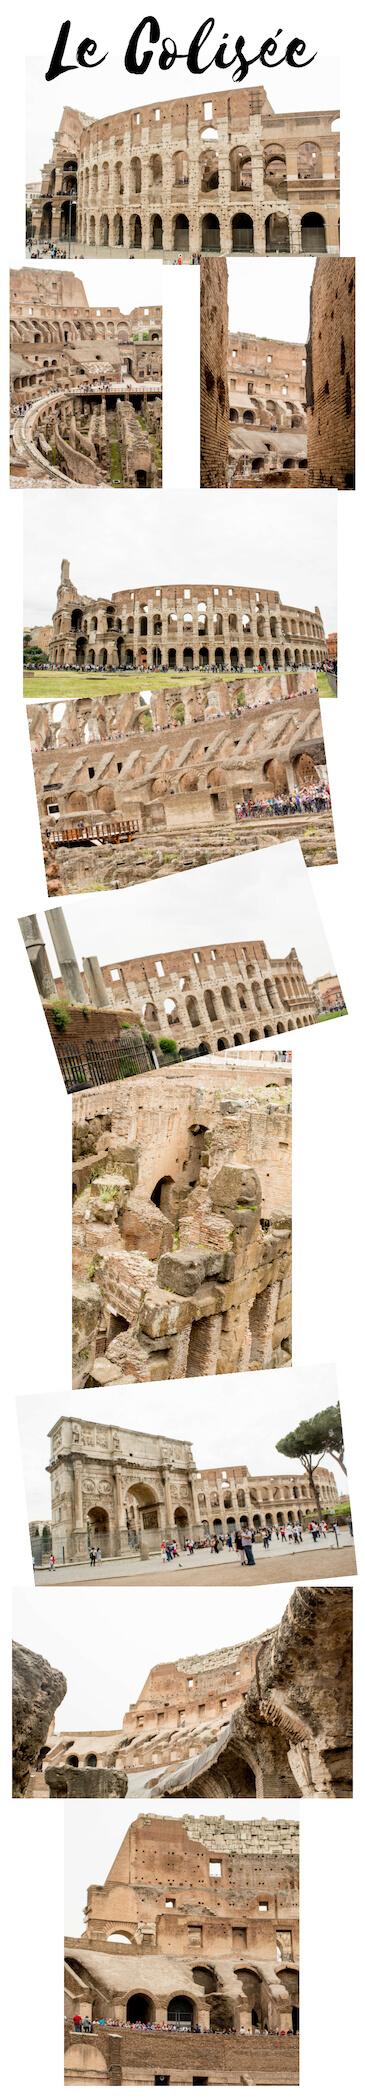 City guide : 7 jours à Rome | happinesscoco.com